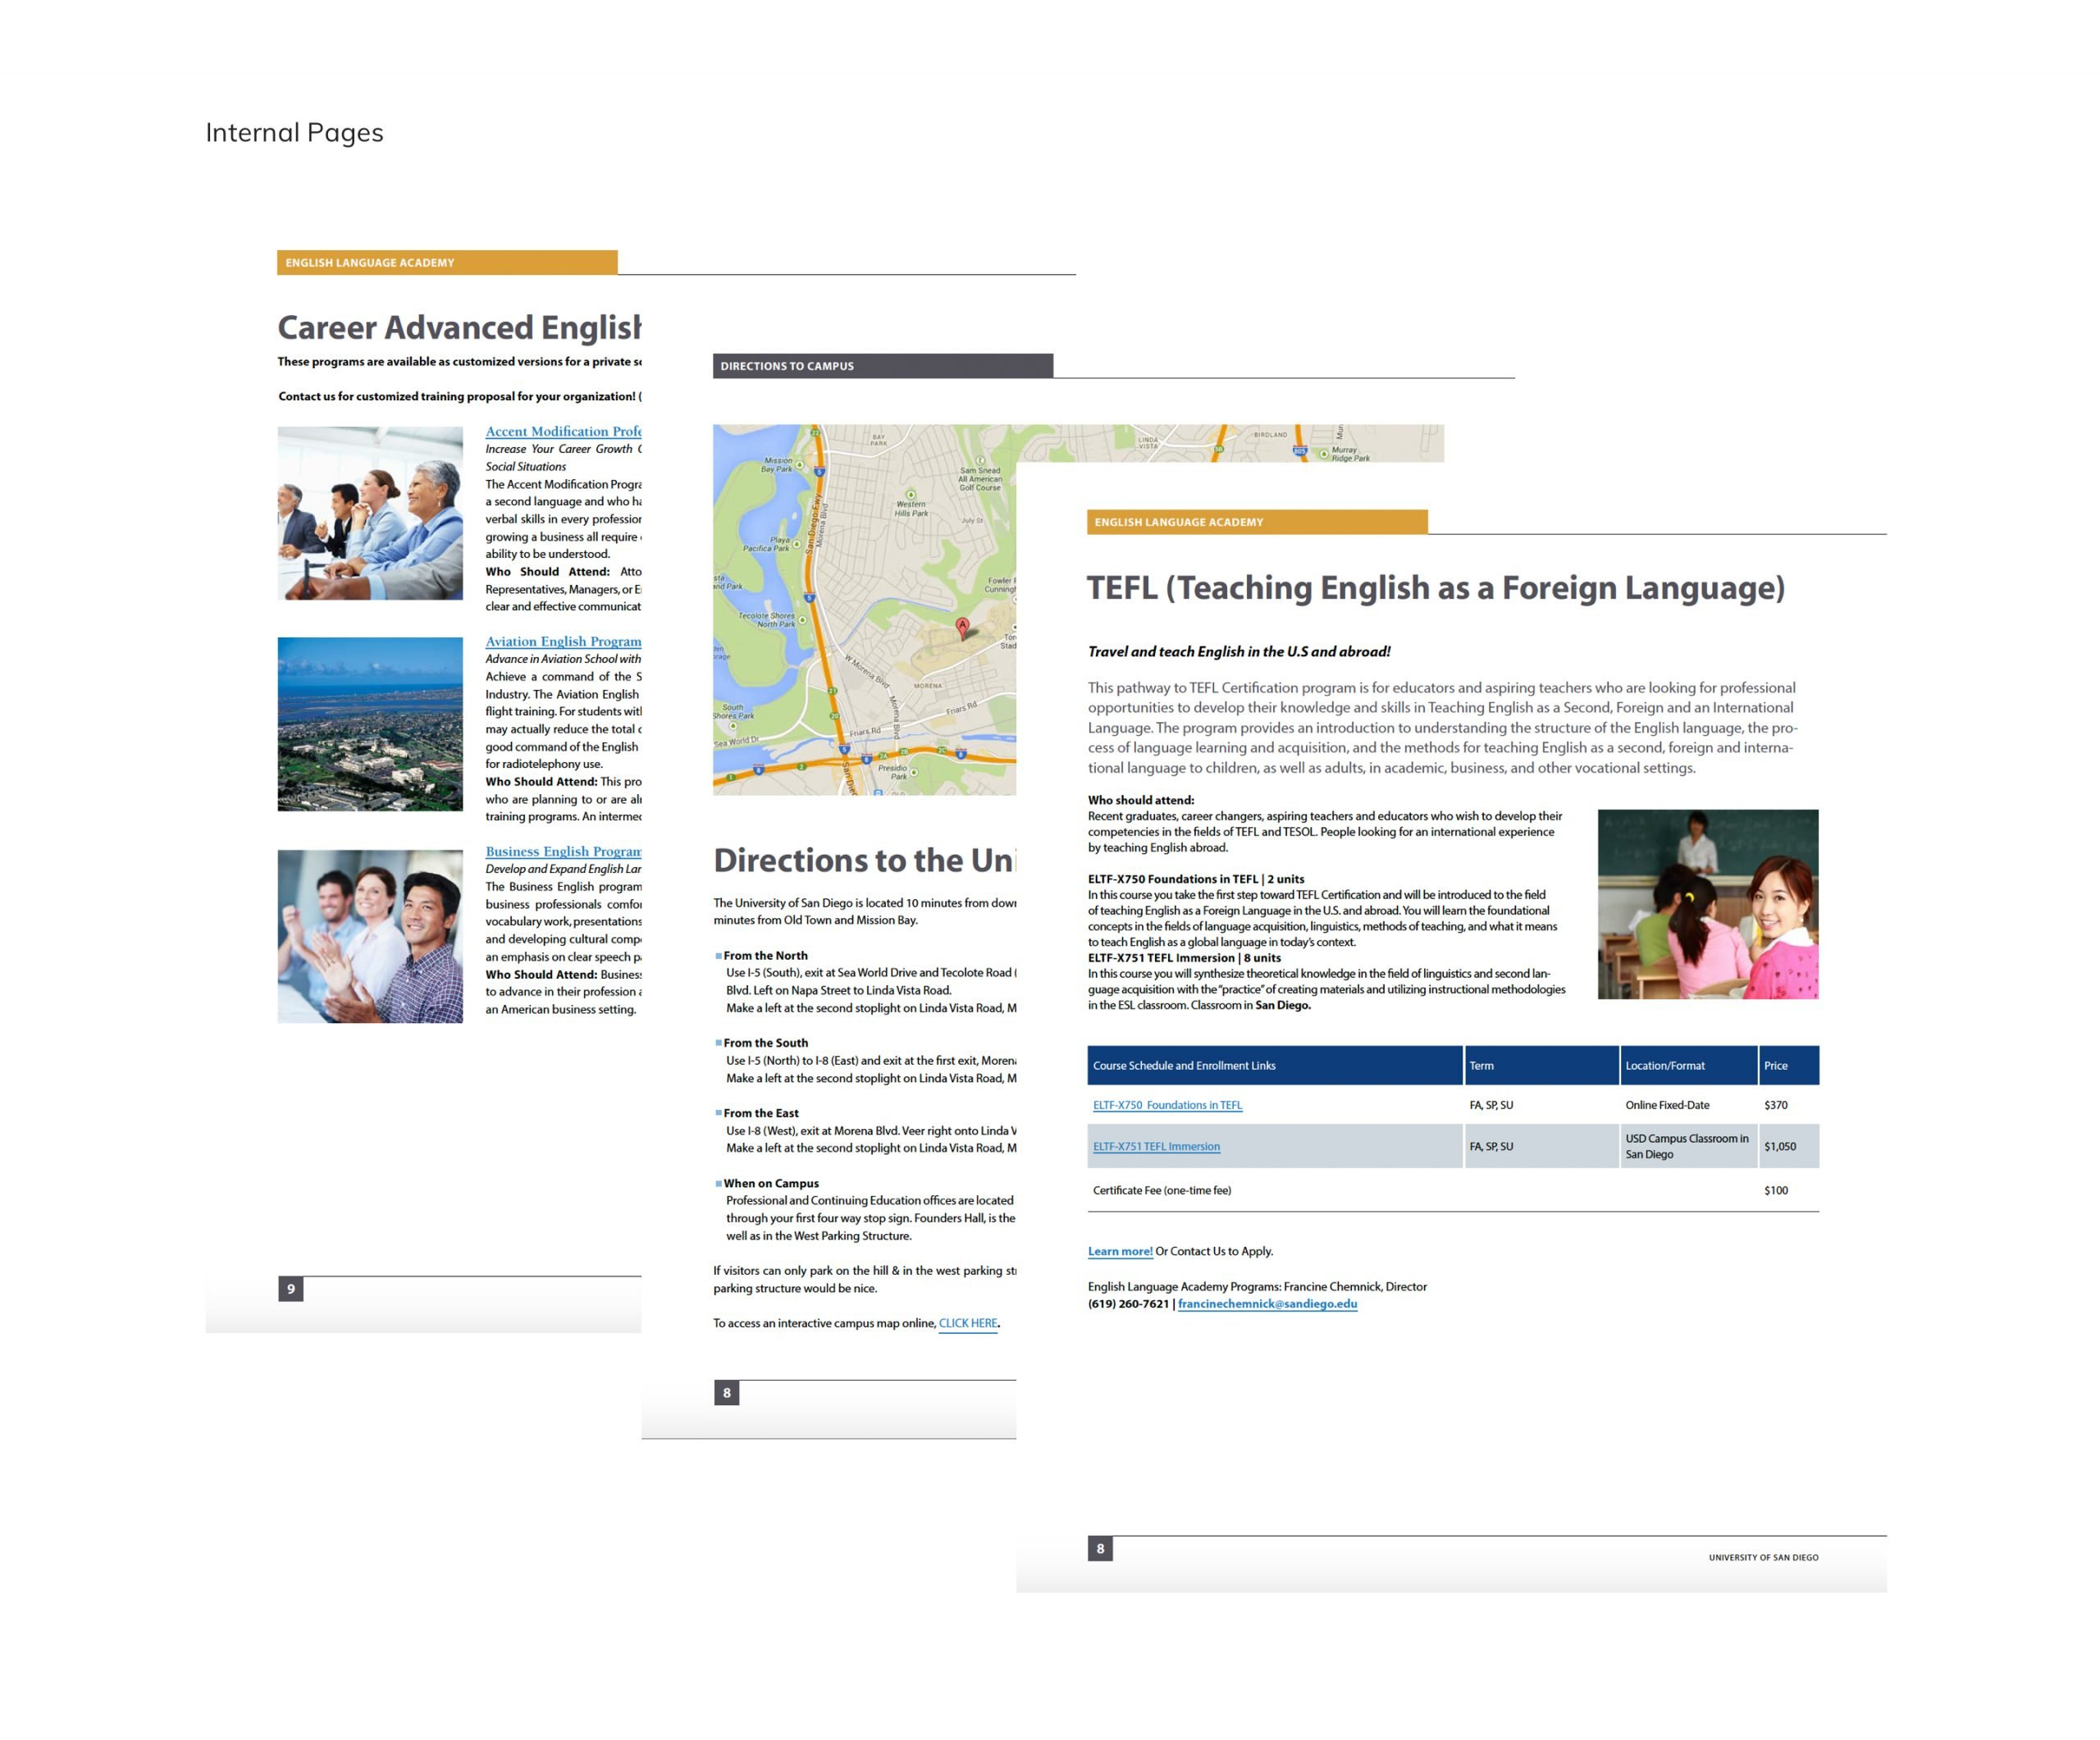 University of San Diego Digital Brochure Internal Pages